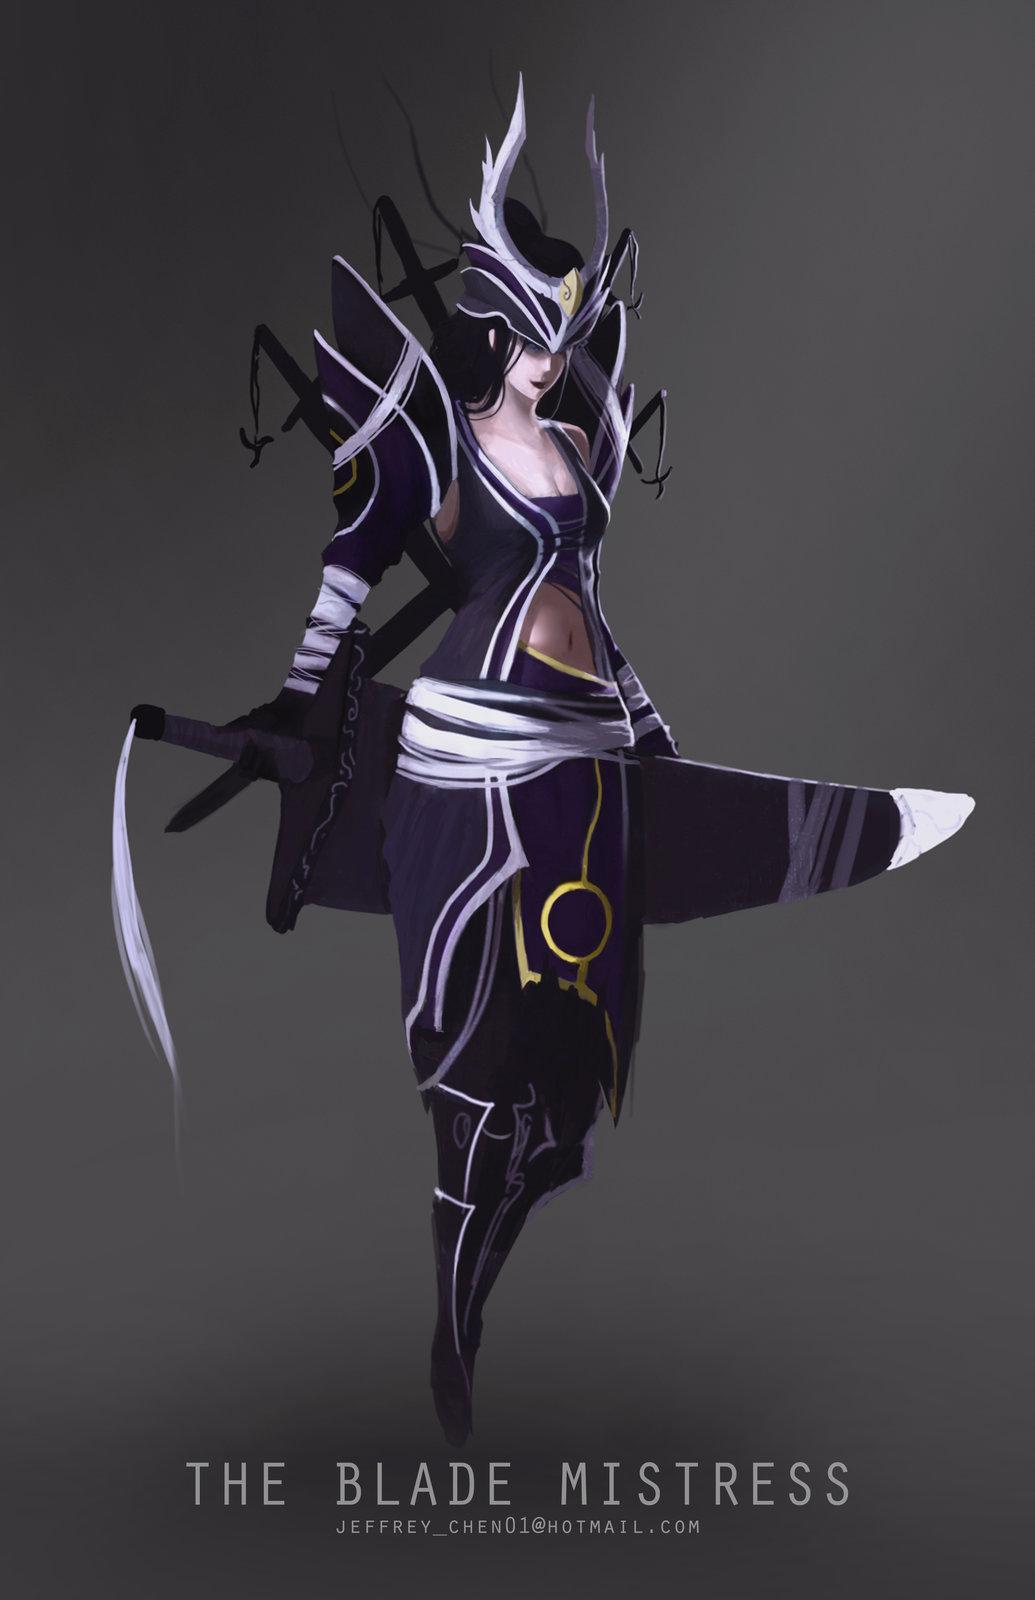 The Blade Mistress